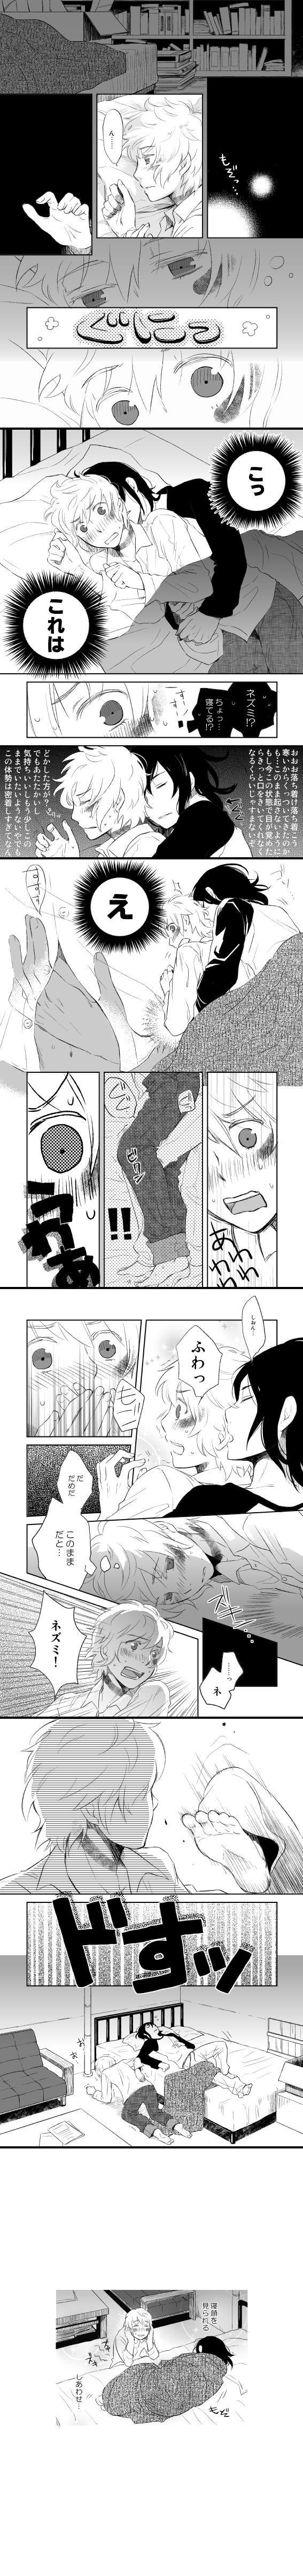 Tags: Anime, Omaru Kei, No.6, Nezumi (No.6), Shion (No.6), Scan, Fanart, Translation Request, Doujinshi Page, Pixiv, NezuShi